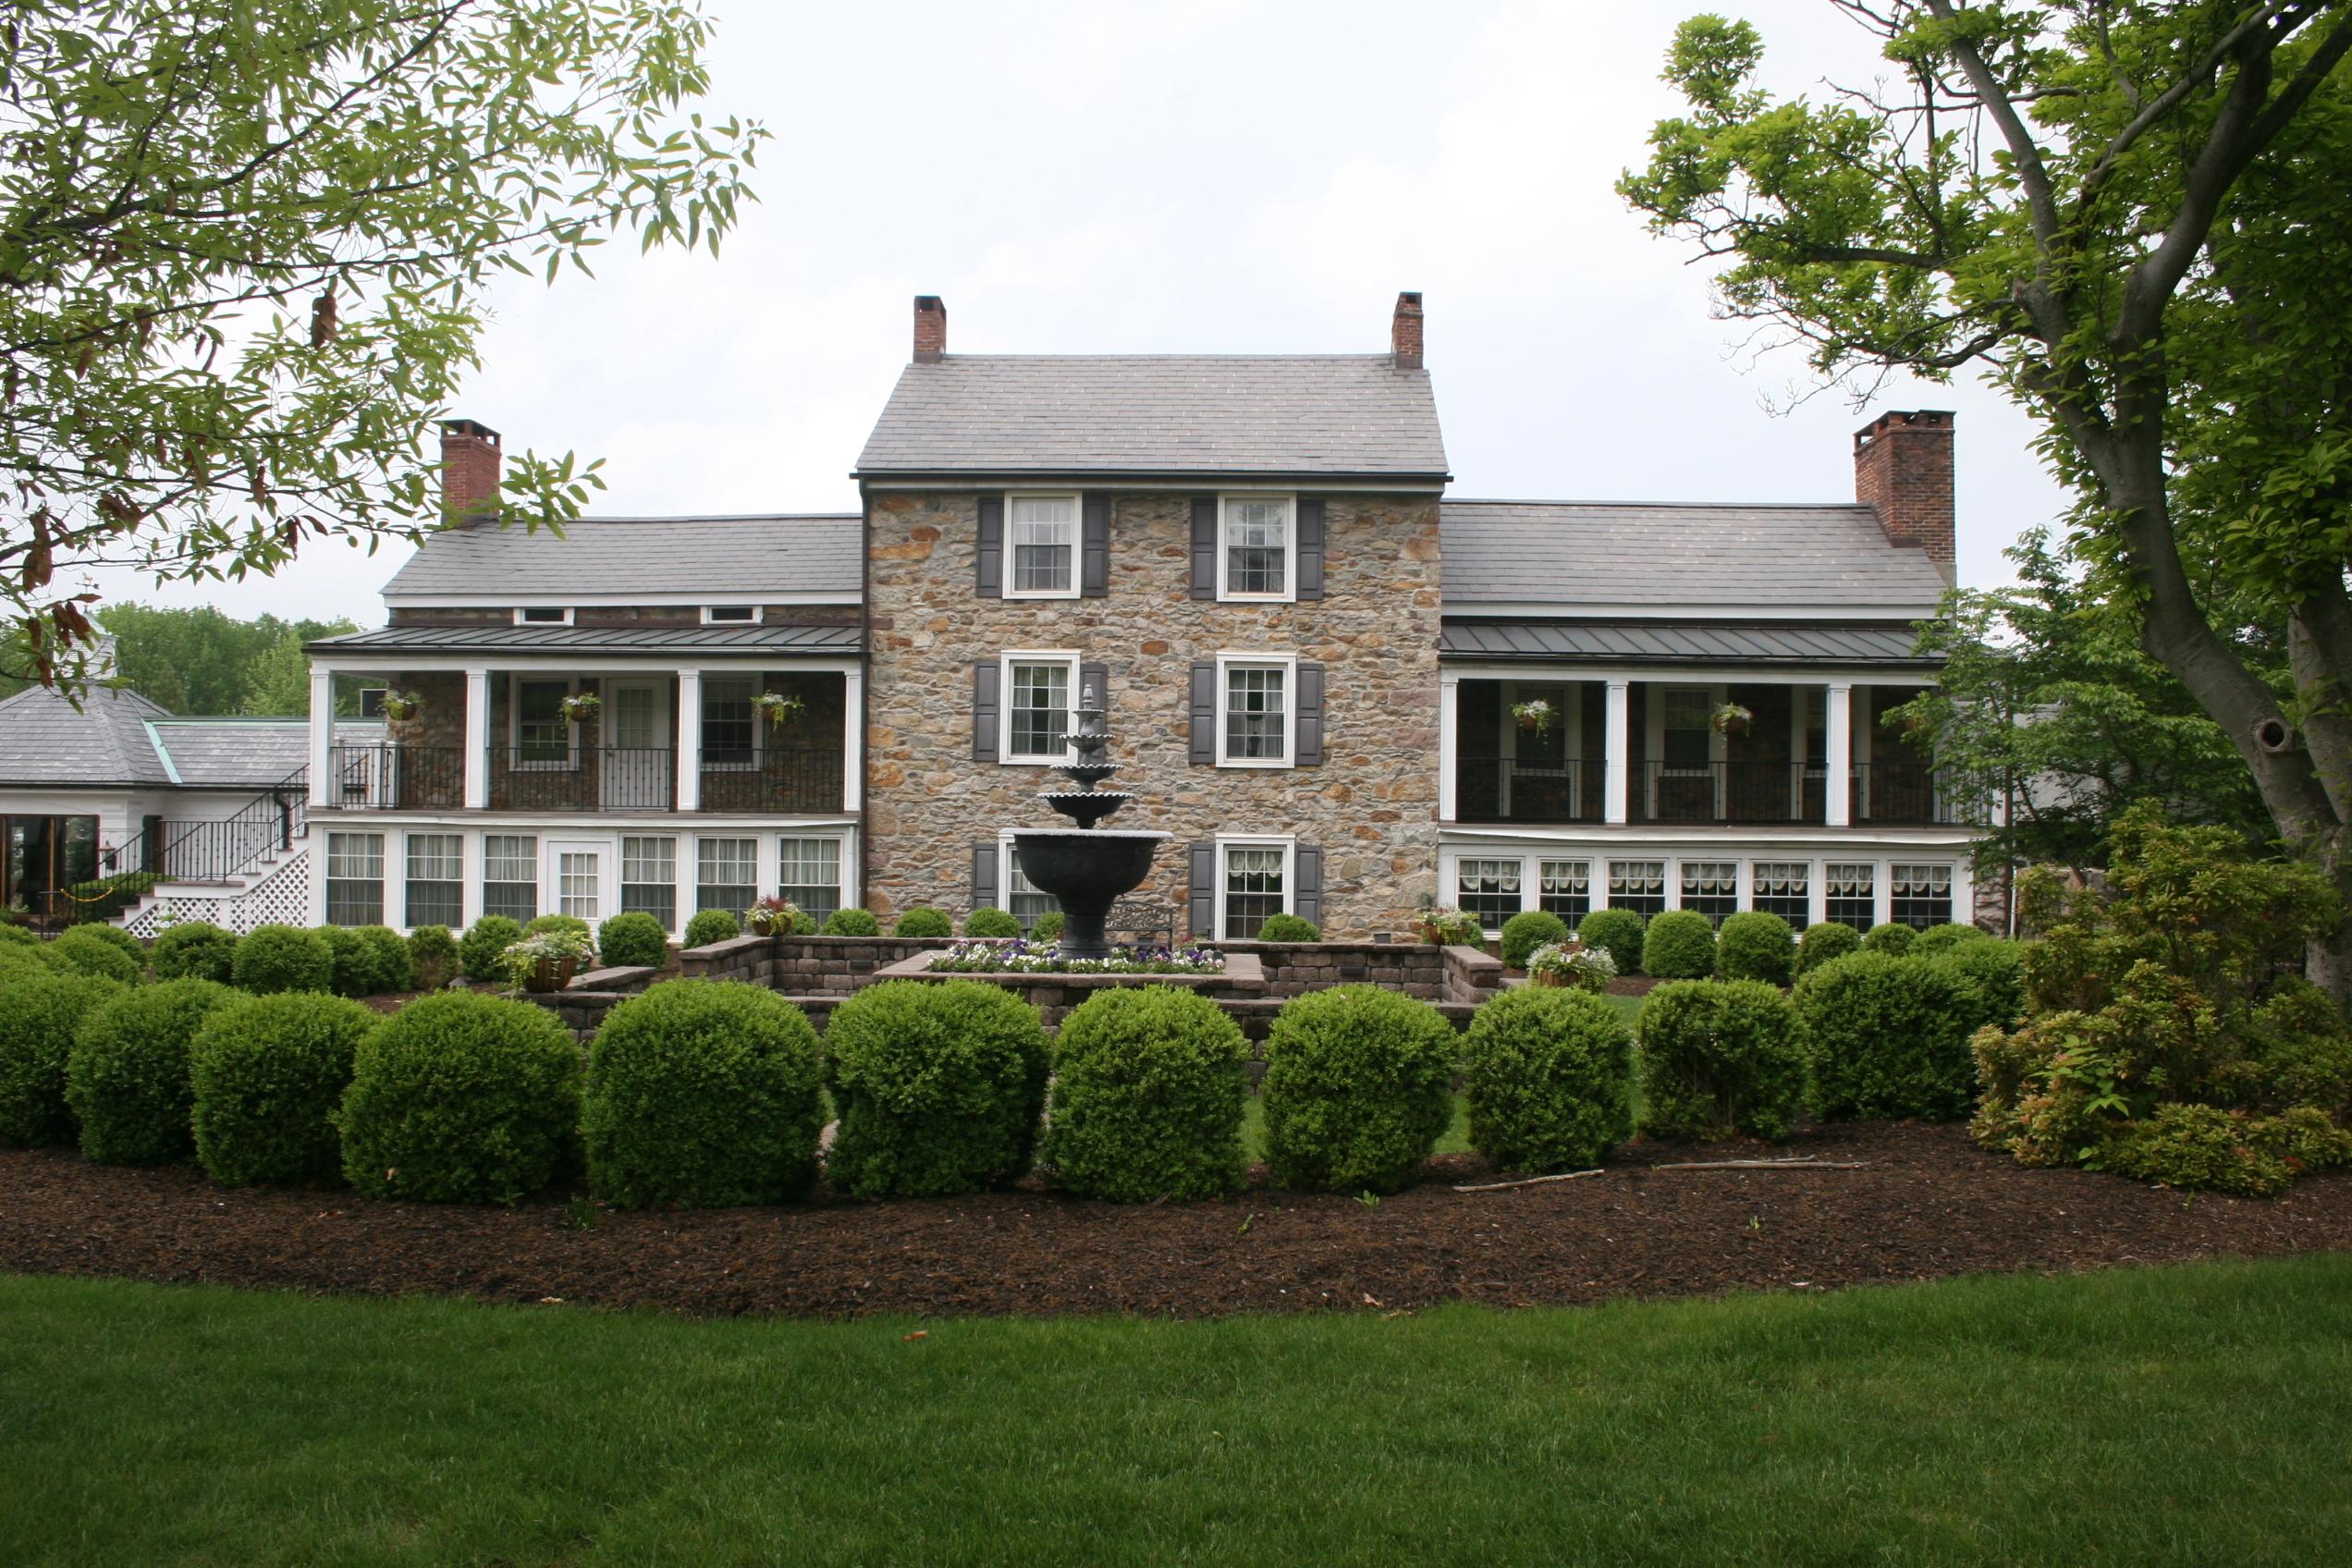 Hampton NJ Wedding Venues The Farmhouse at the Grand Colonial Venue for Weddings